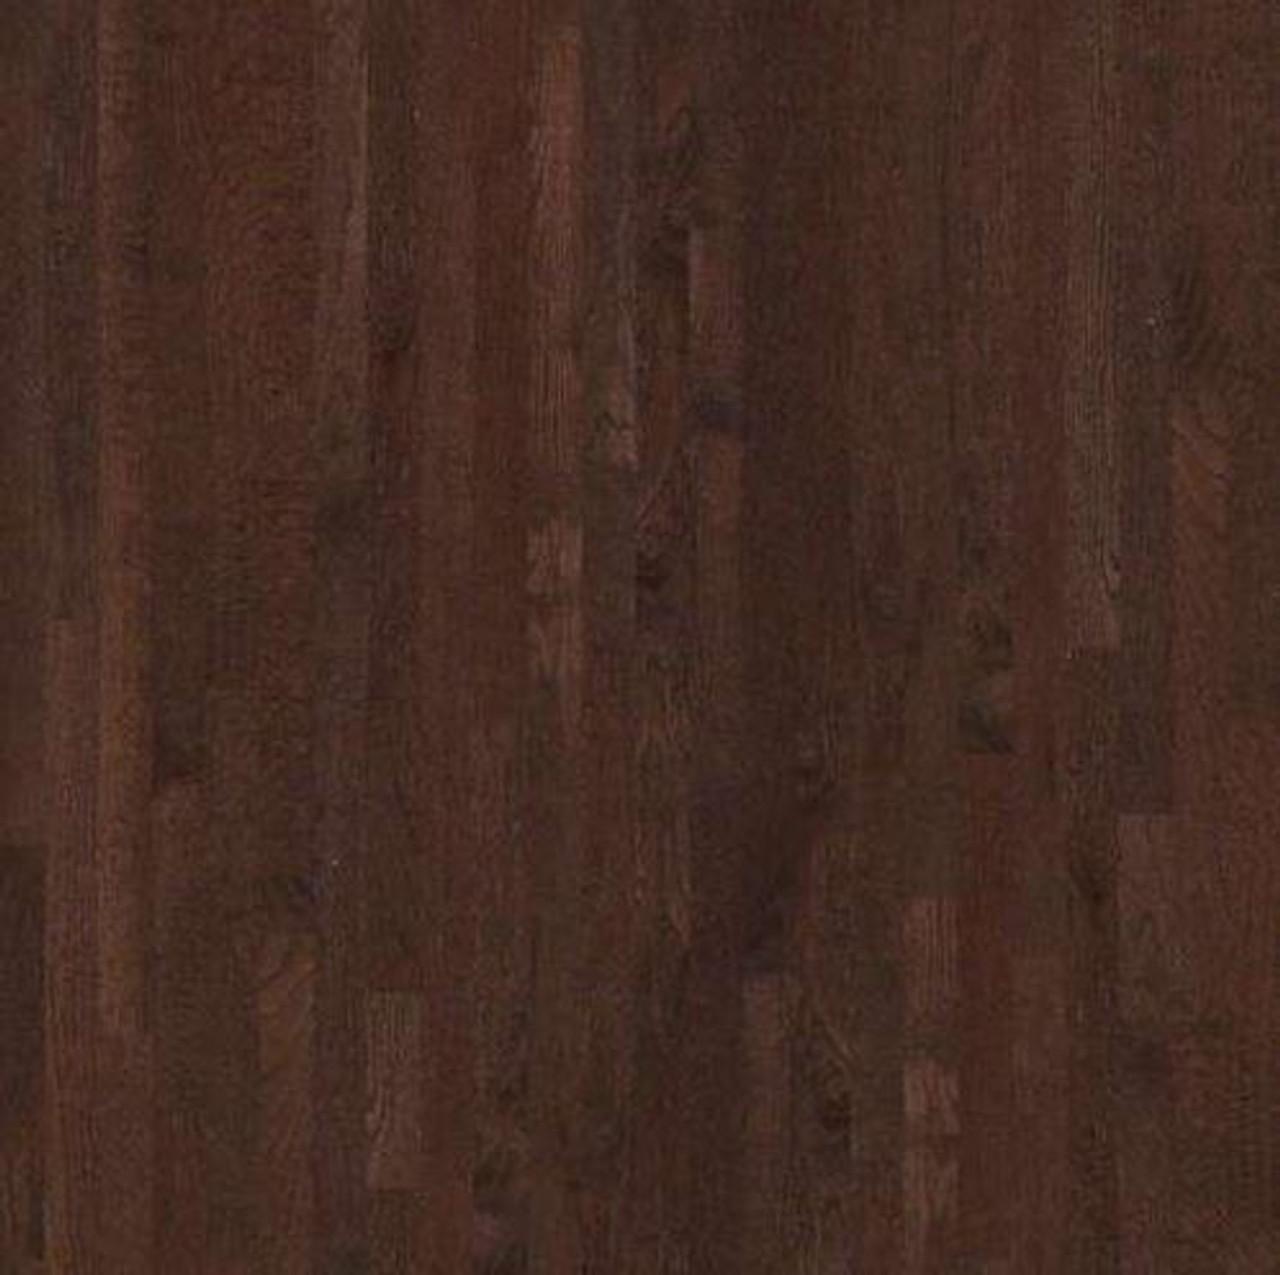 "Shaw Coffee Bean   3-1/4"" x 3/4""   Solid Hardwood   1st Quality [27 SF / Box]"